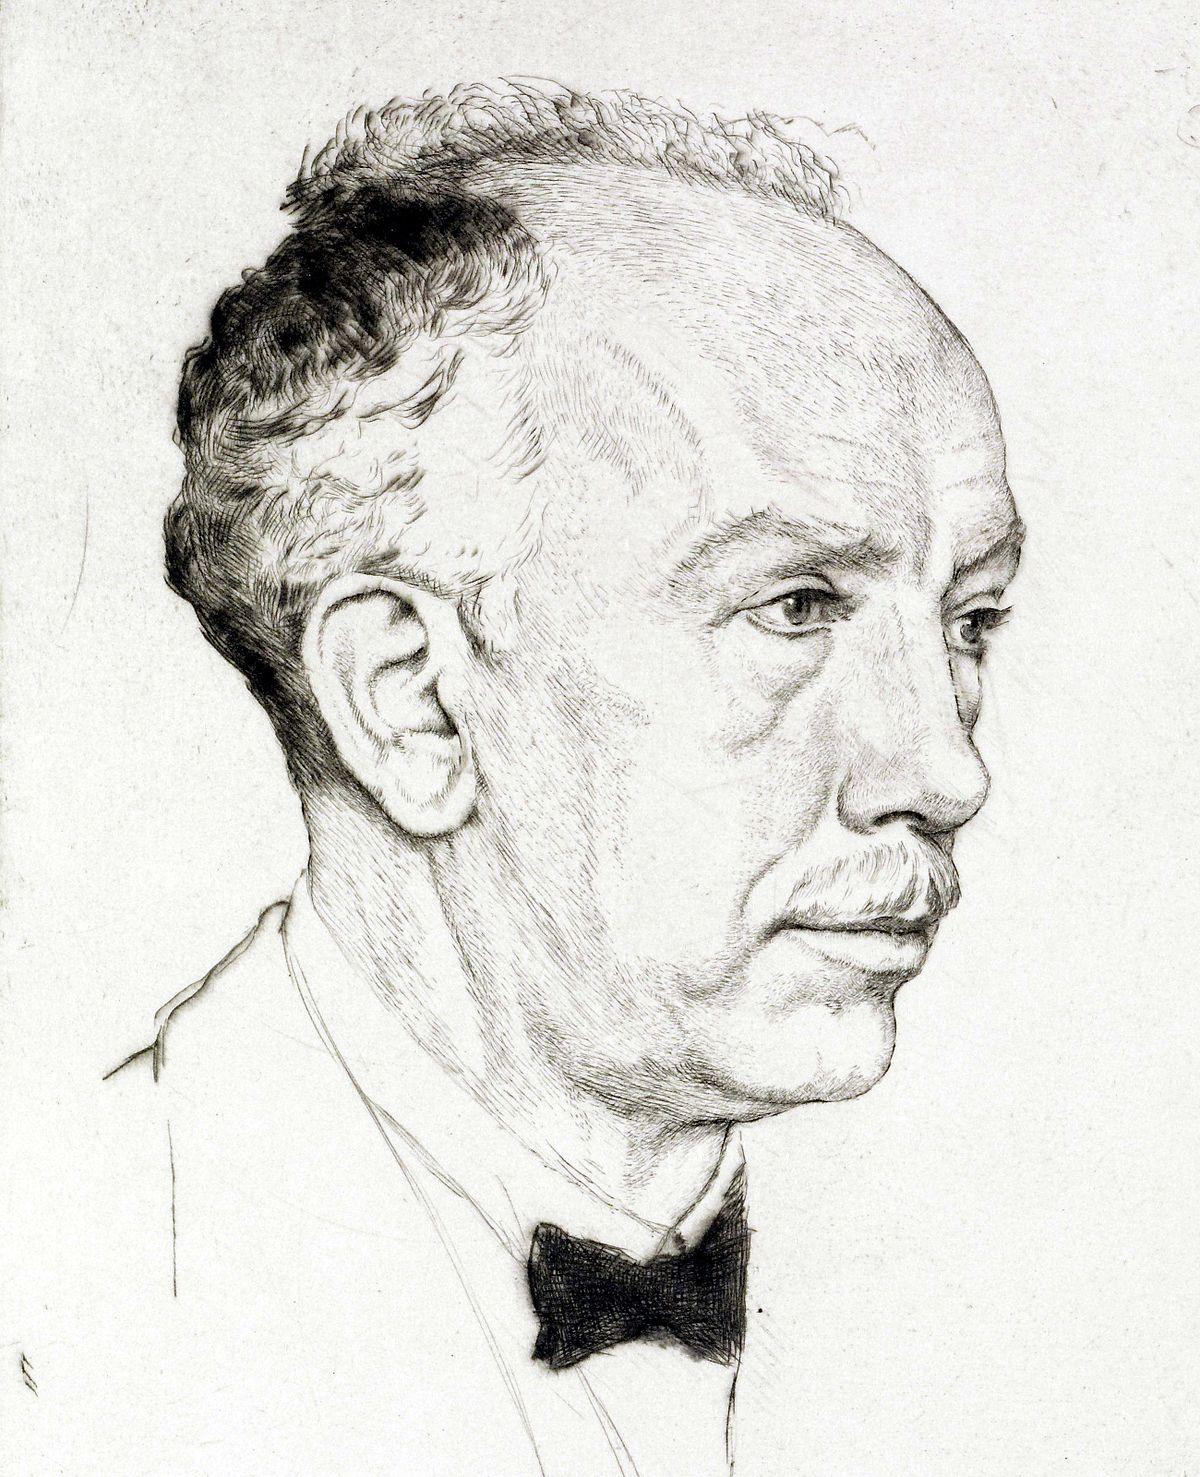 Sechs Lieder Op 68 Strauss